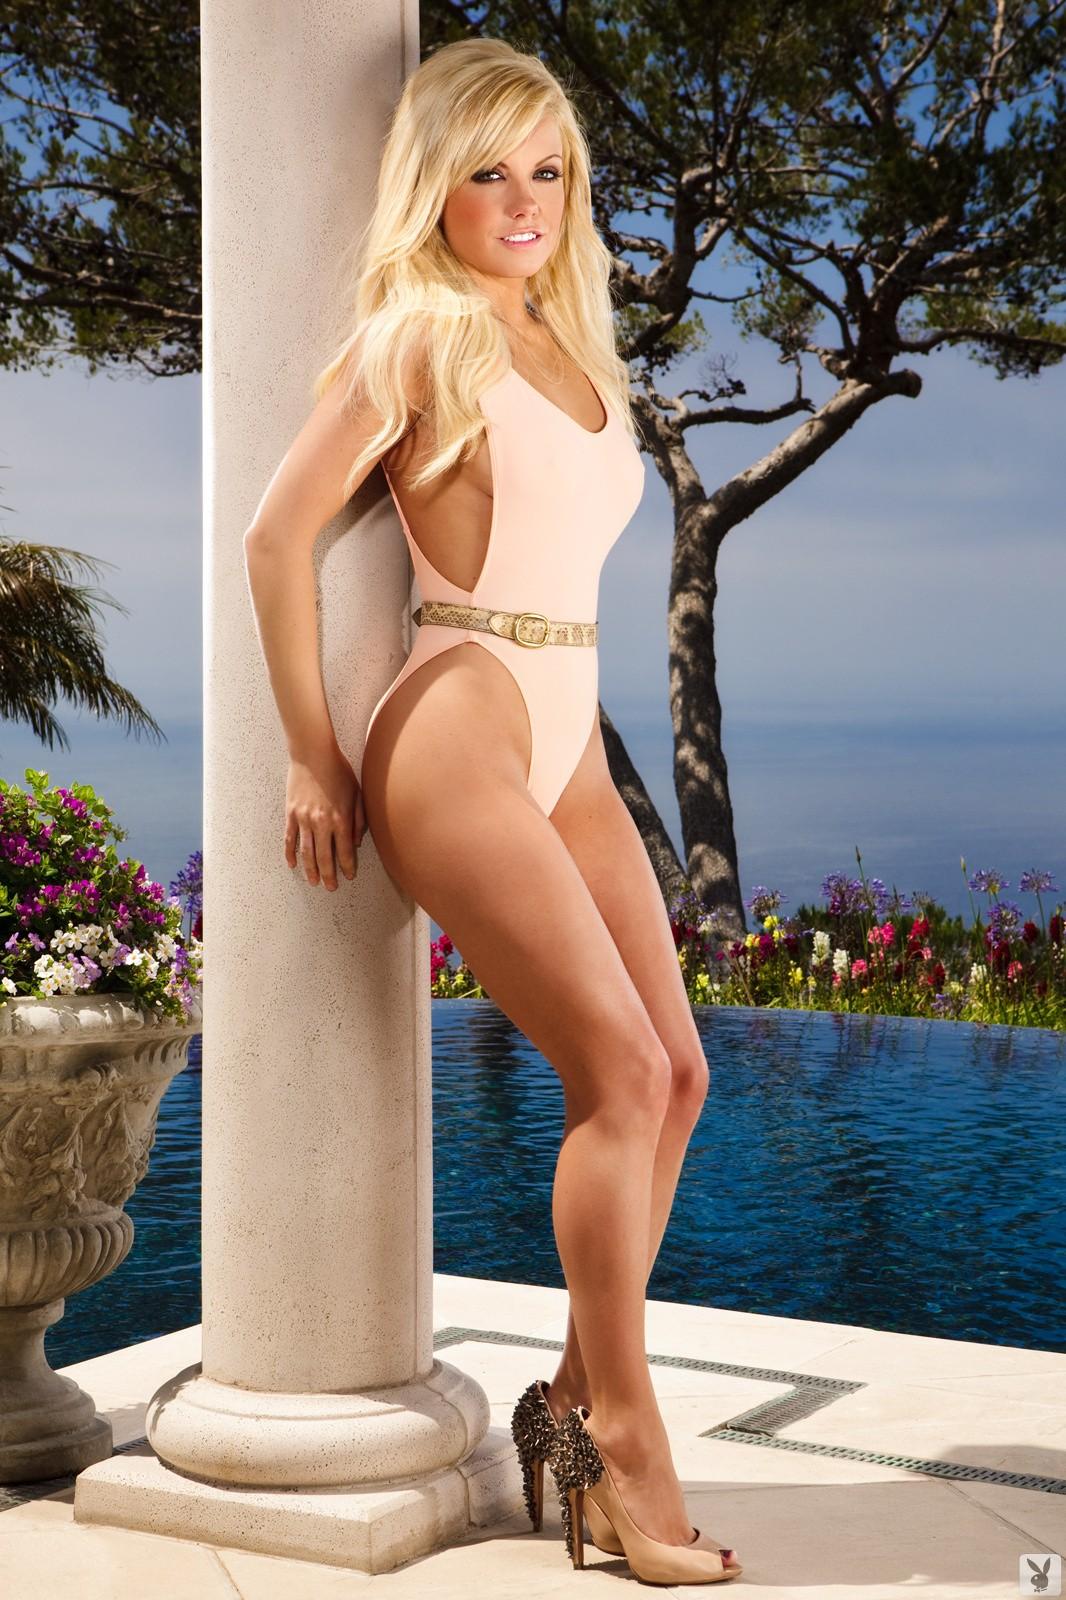 playboy-naked-girls-wearing-high-heels-ripped-redhead-nude